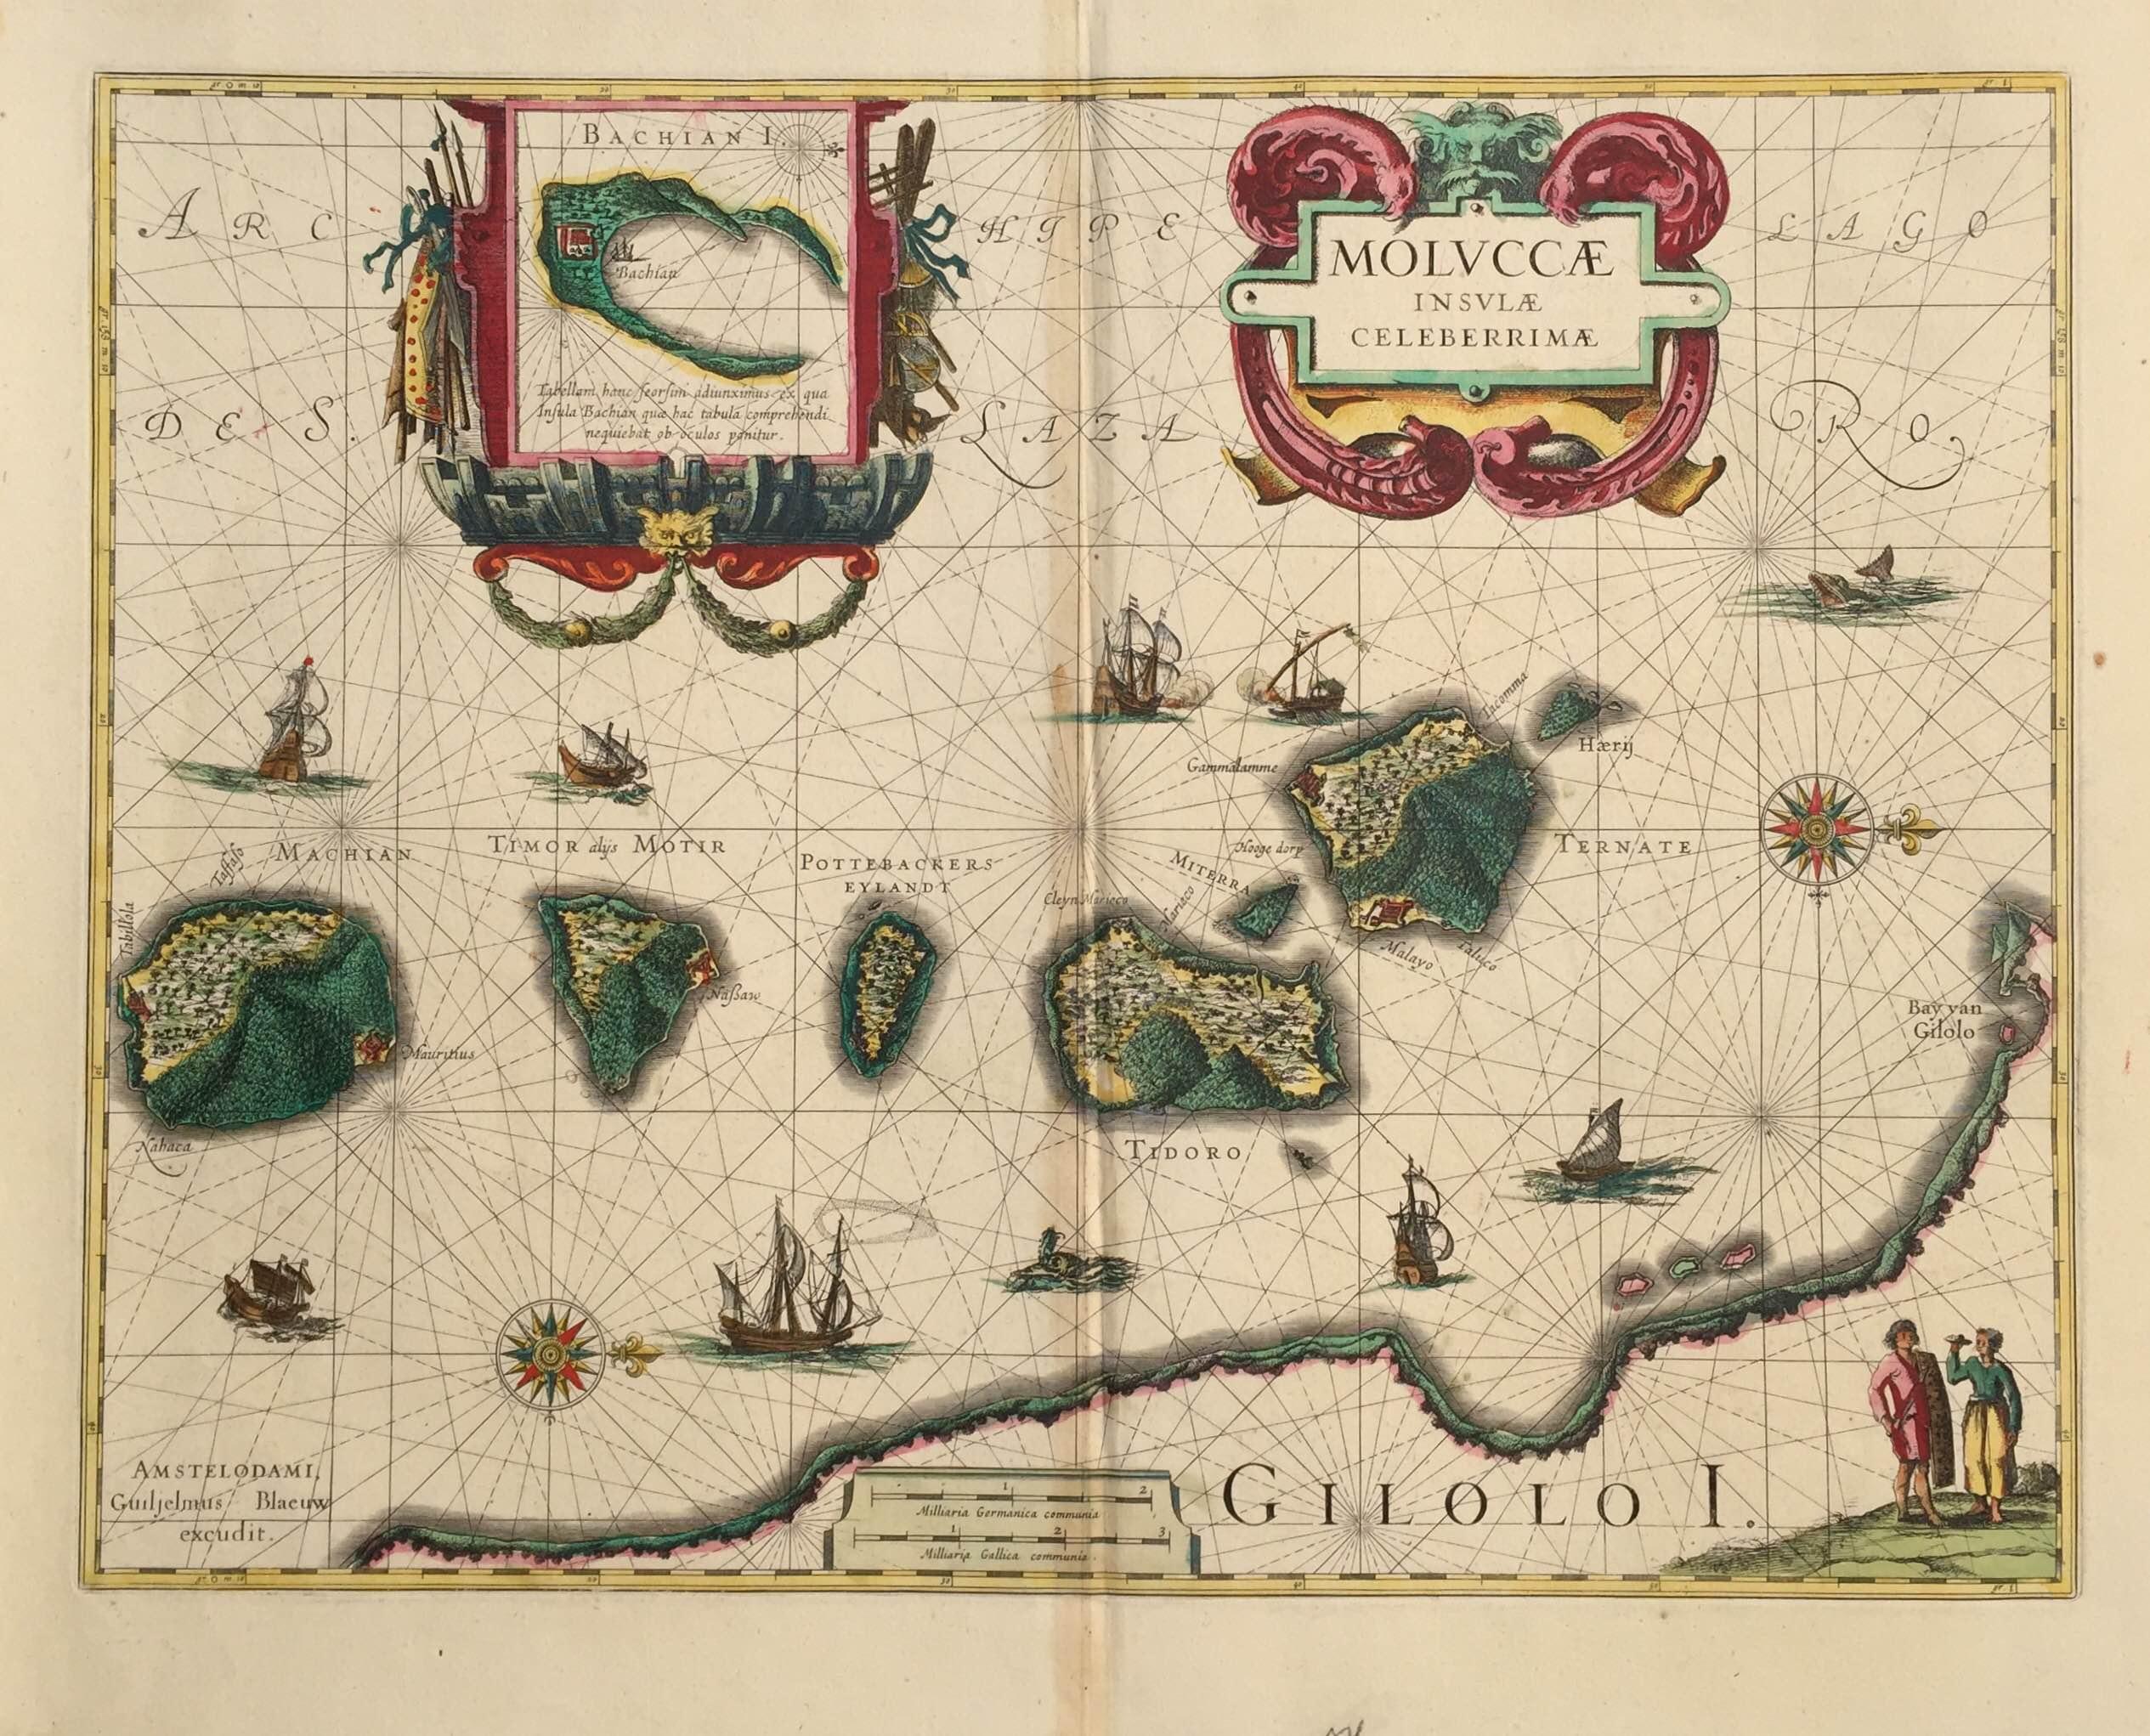 Antique Map Spice Islands by Blaeu (c.1630)